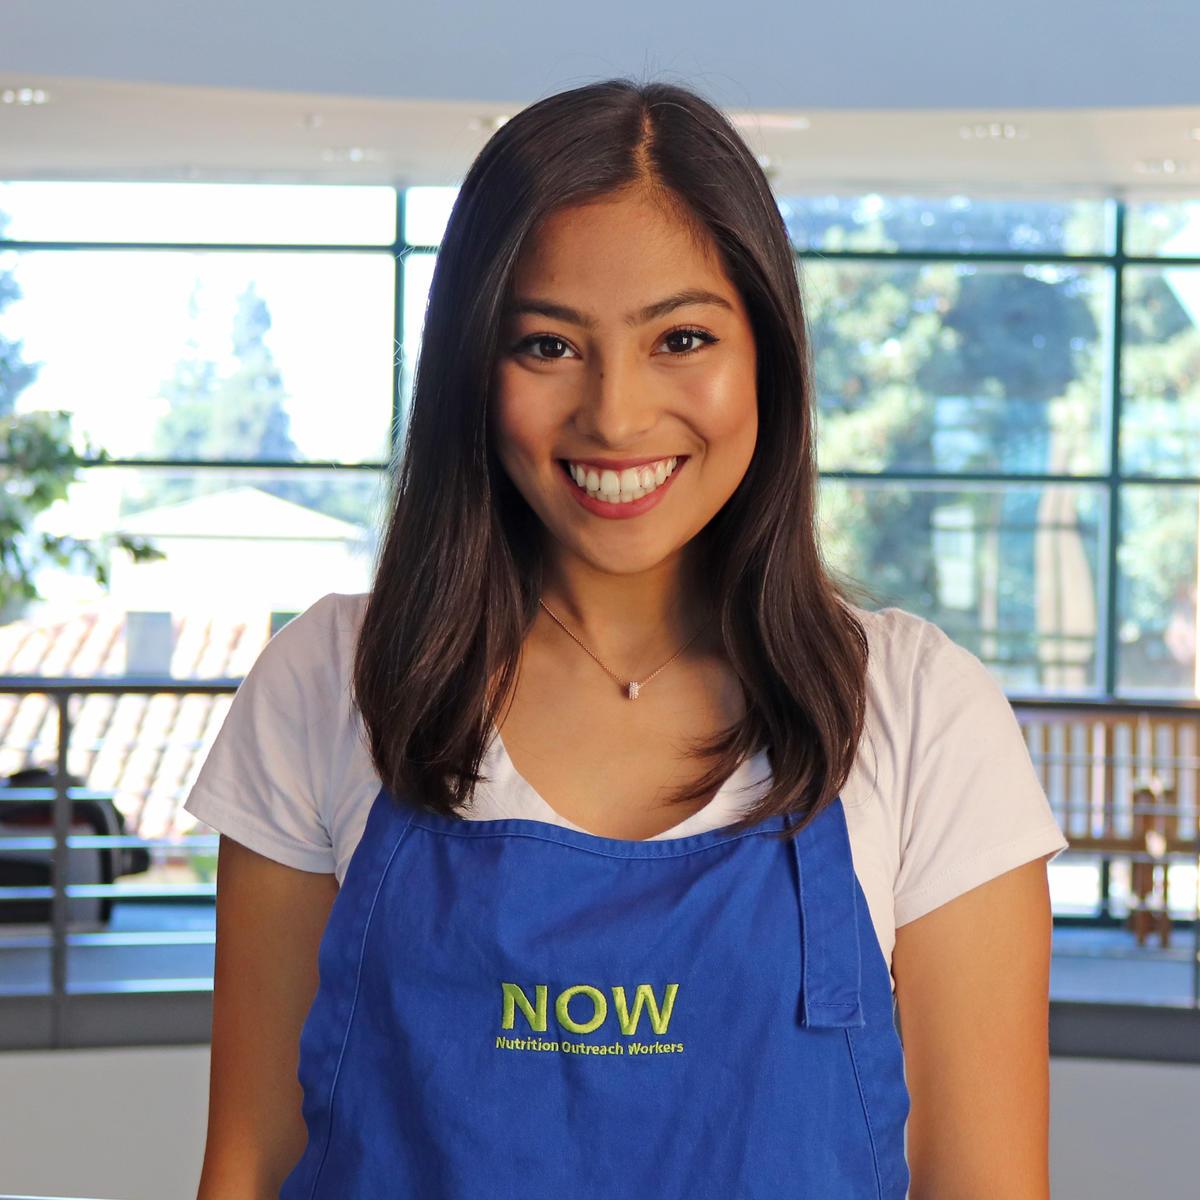 Nutrition Outreach Worker: Sydney